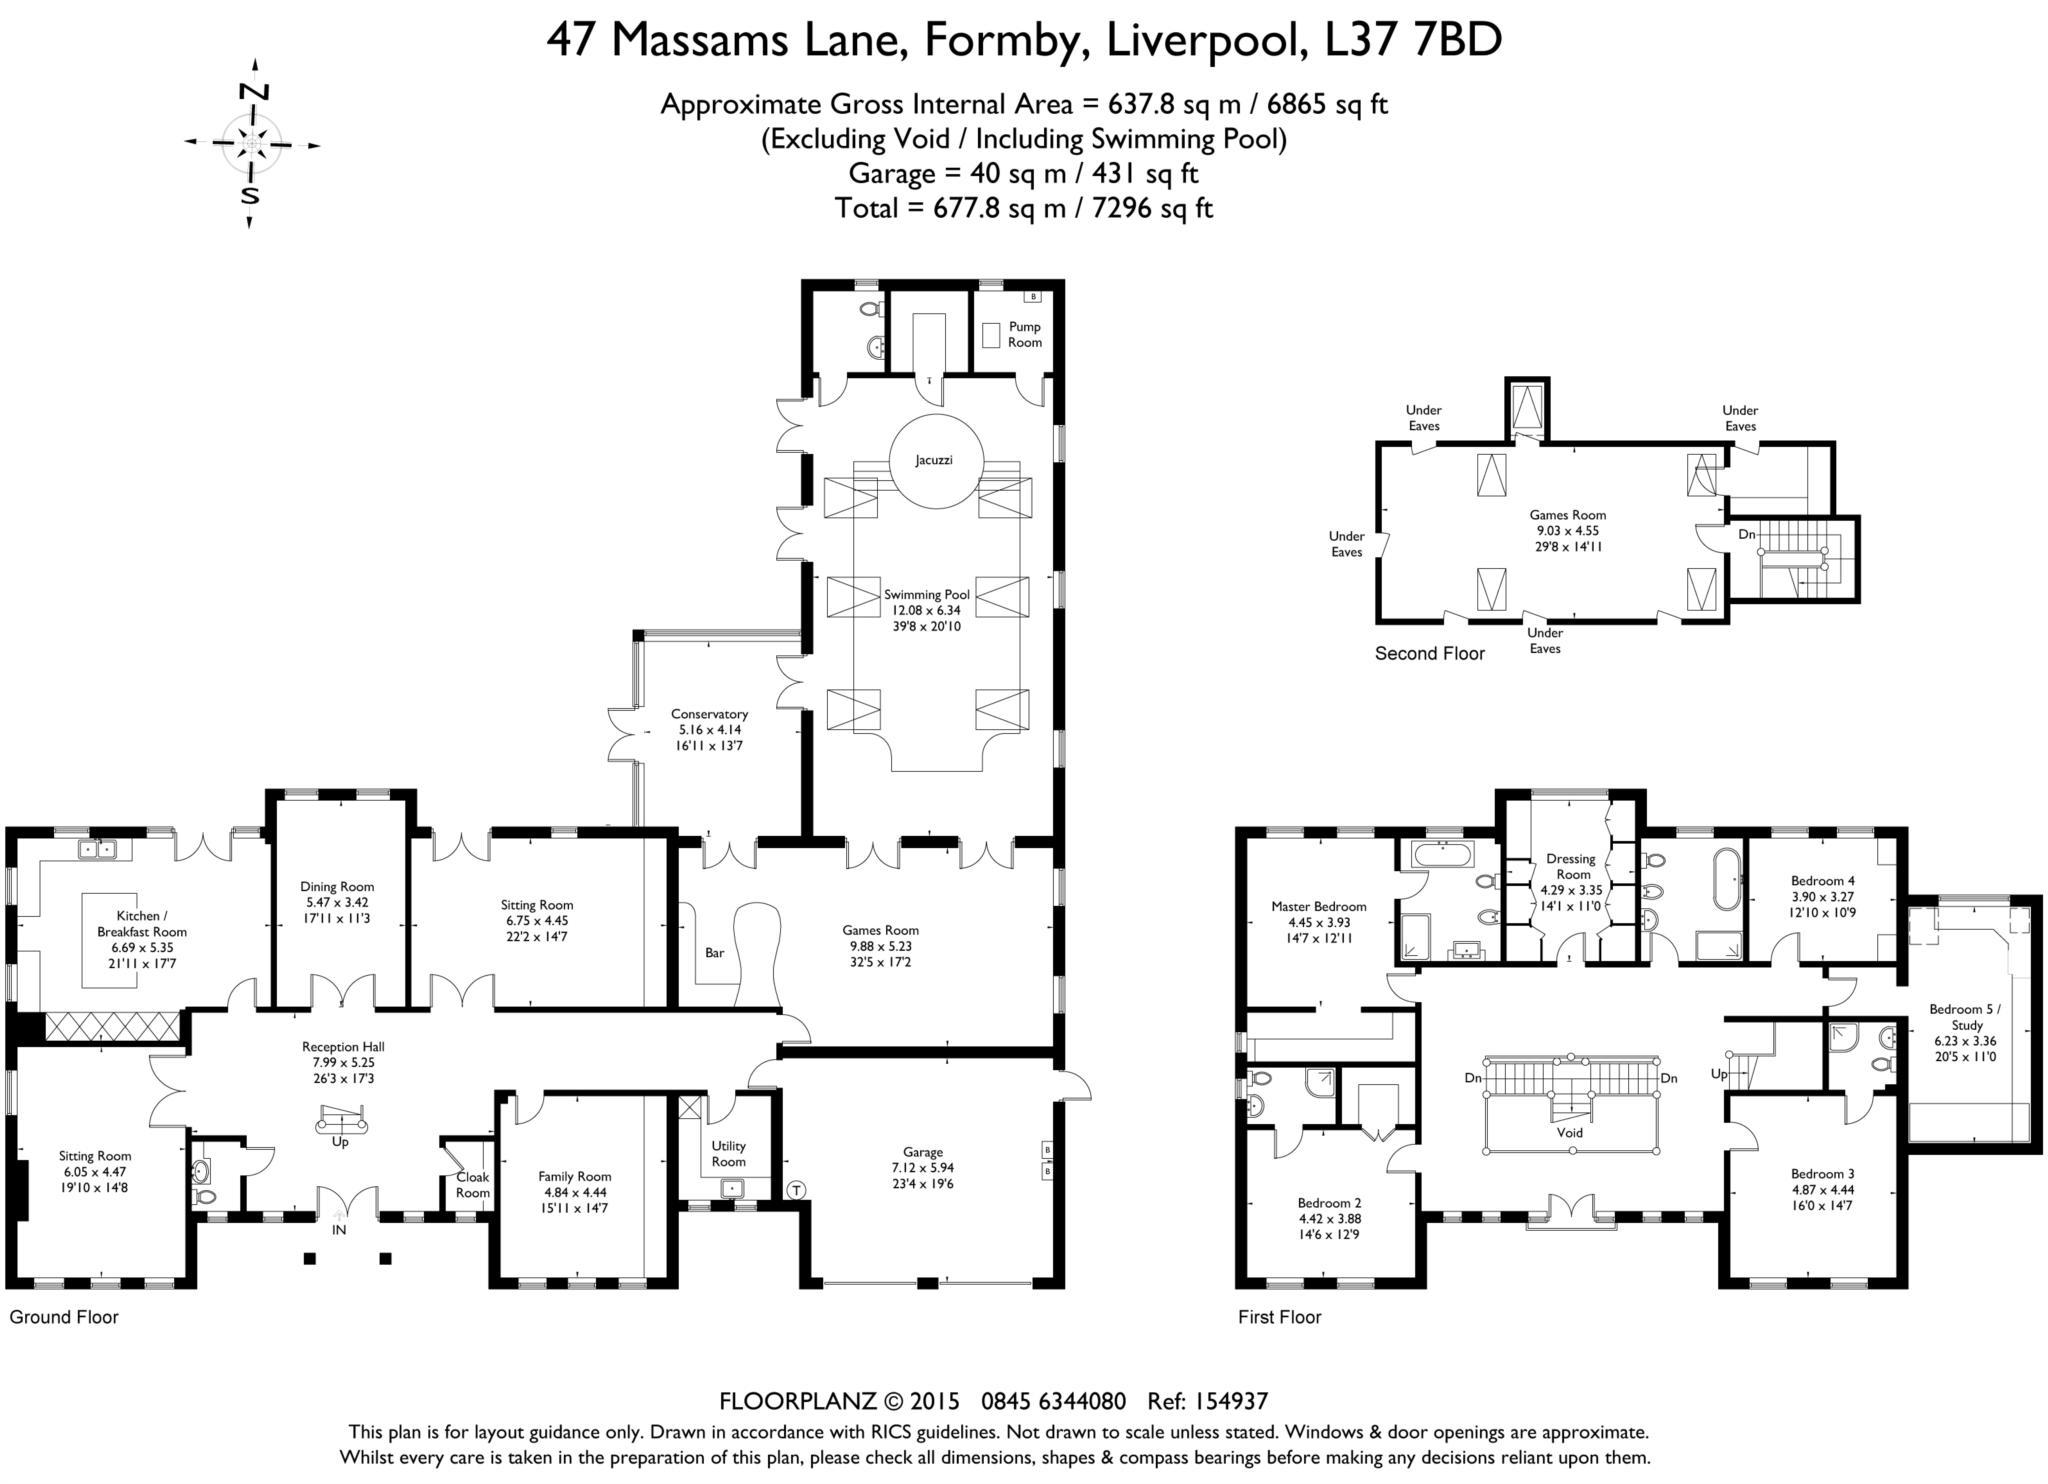 6 bedroom detached for sale in liverpool